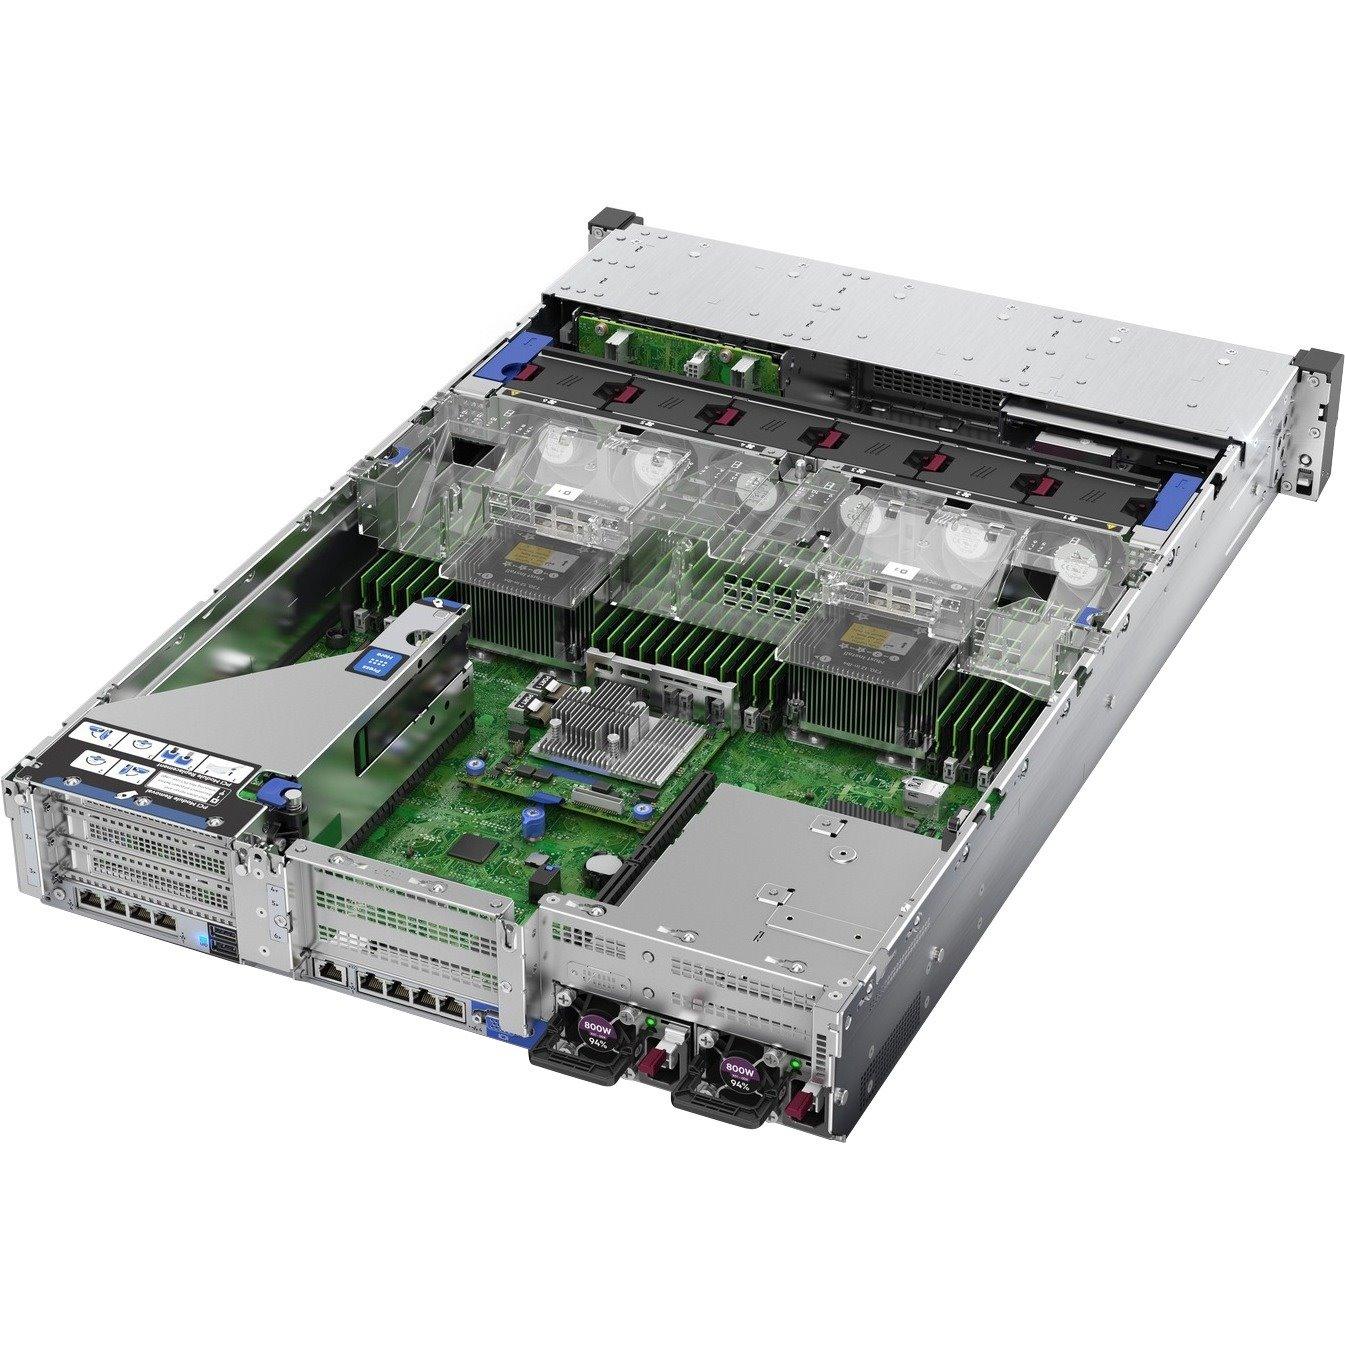 HPE ProLiant DL380 G10 2U Rack Server - 1 x Intel Xeon Gold 6242 2.80 GHz - 32 GB RAM - Serial ATA/600, 12Gb/s SAS Controller